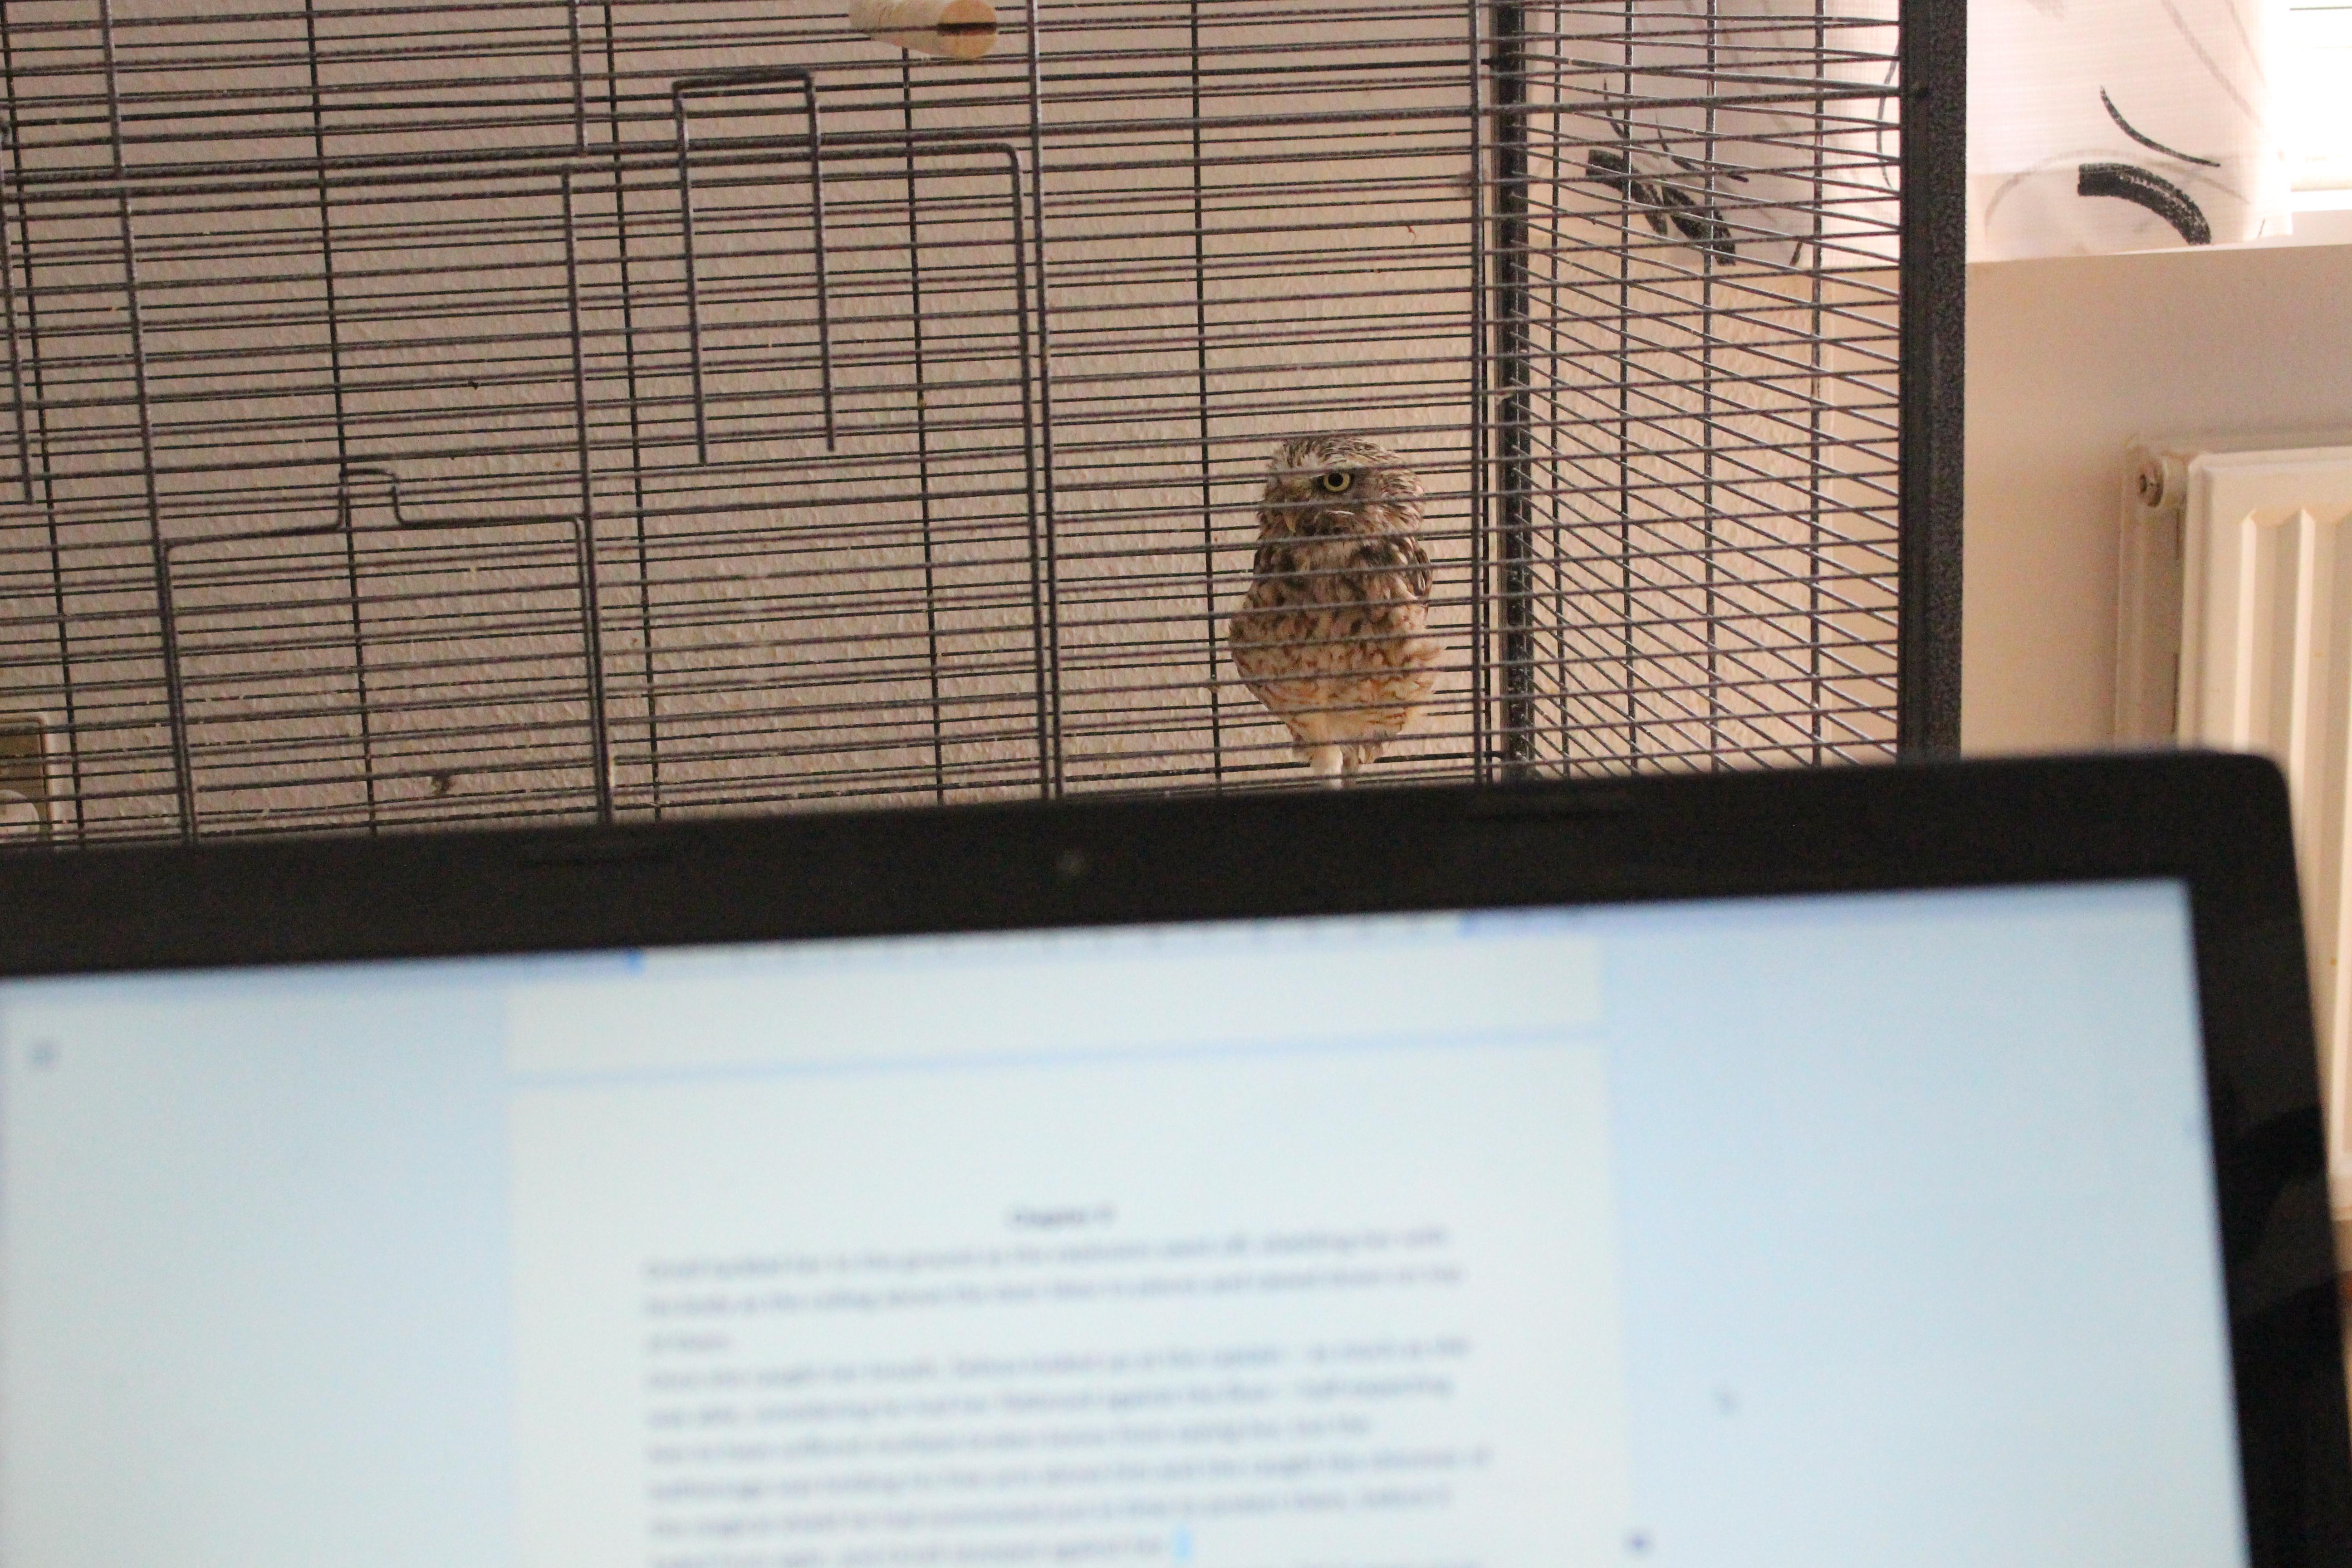 Editing Owl